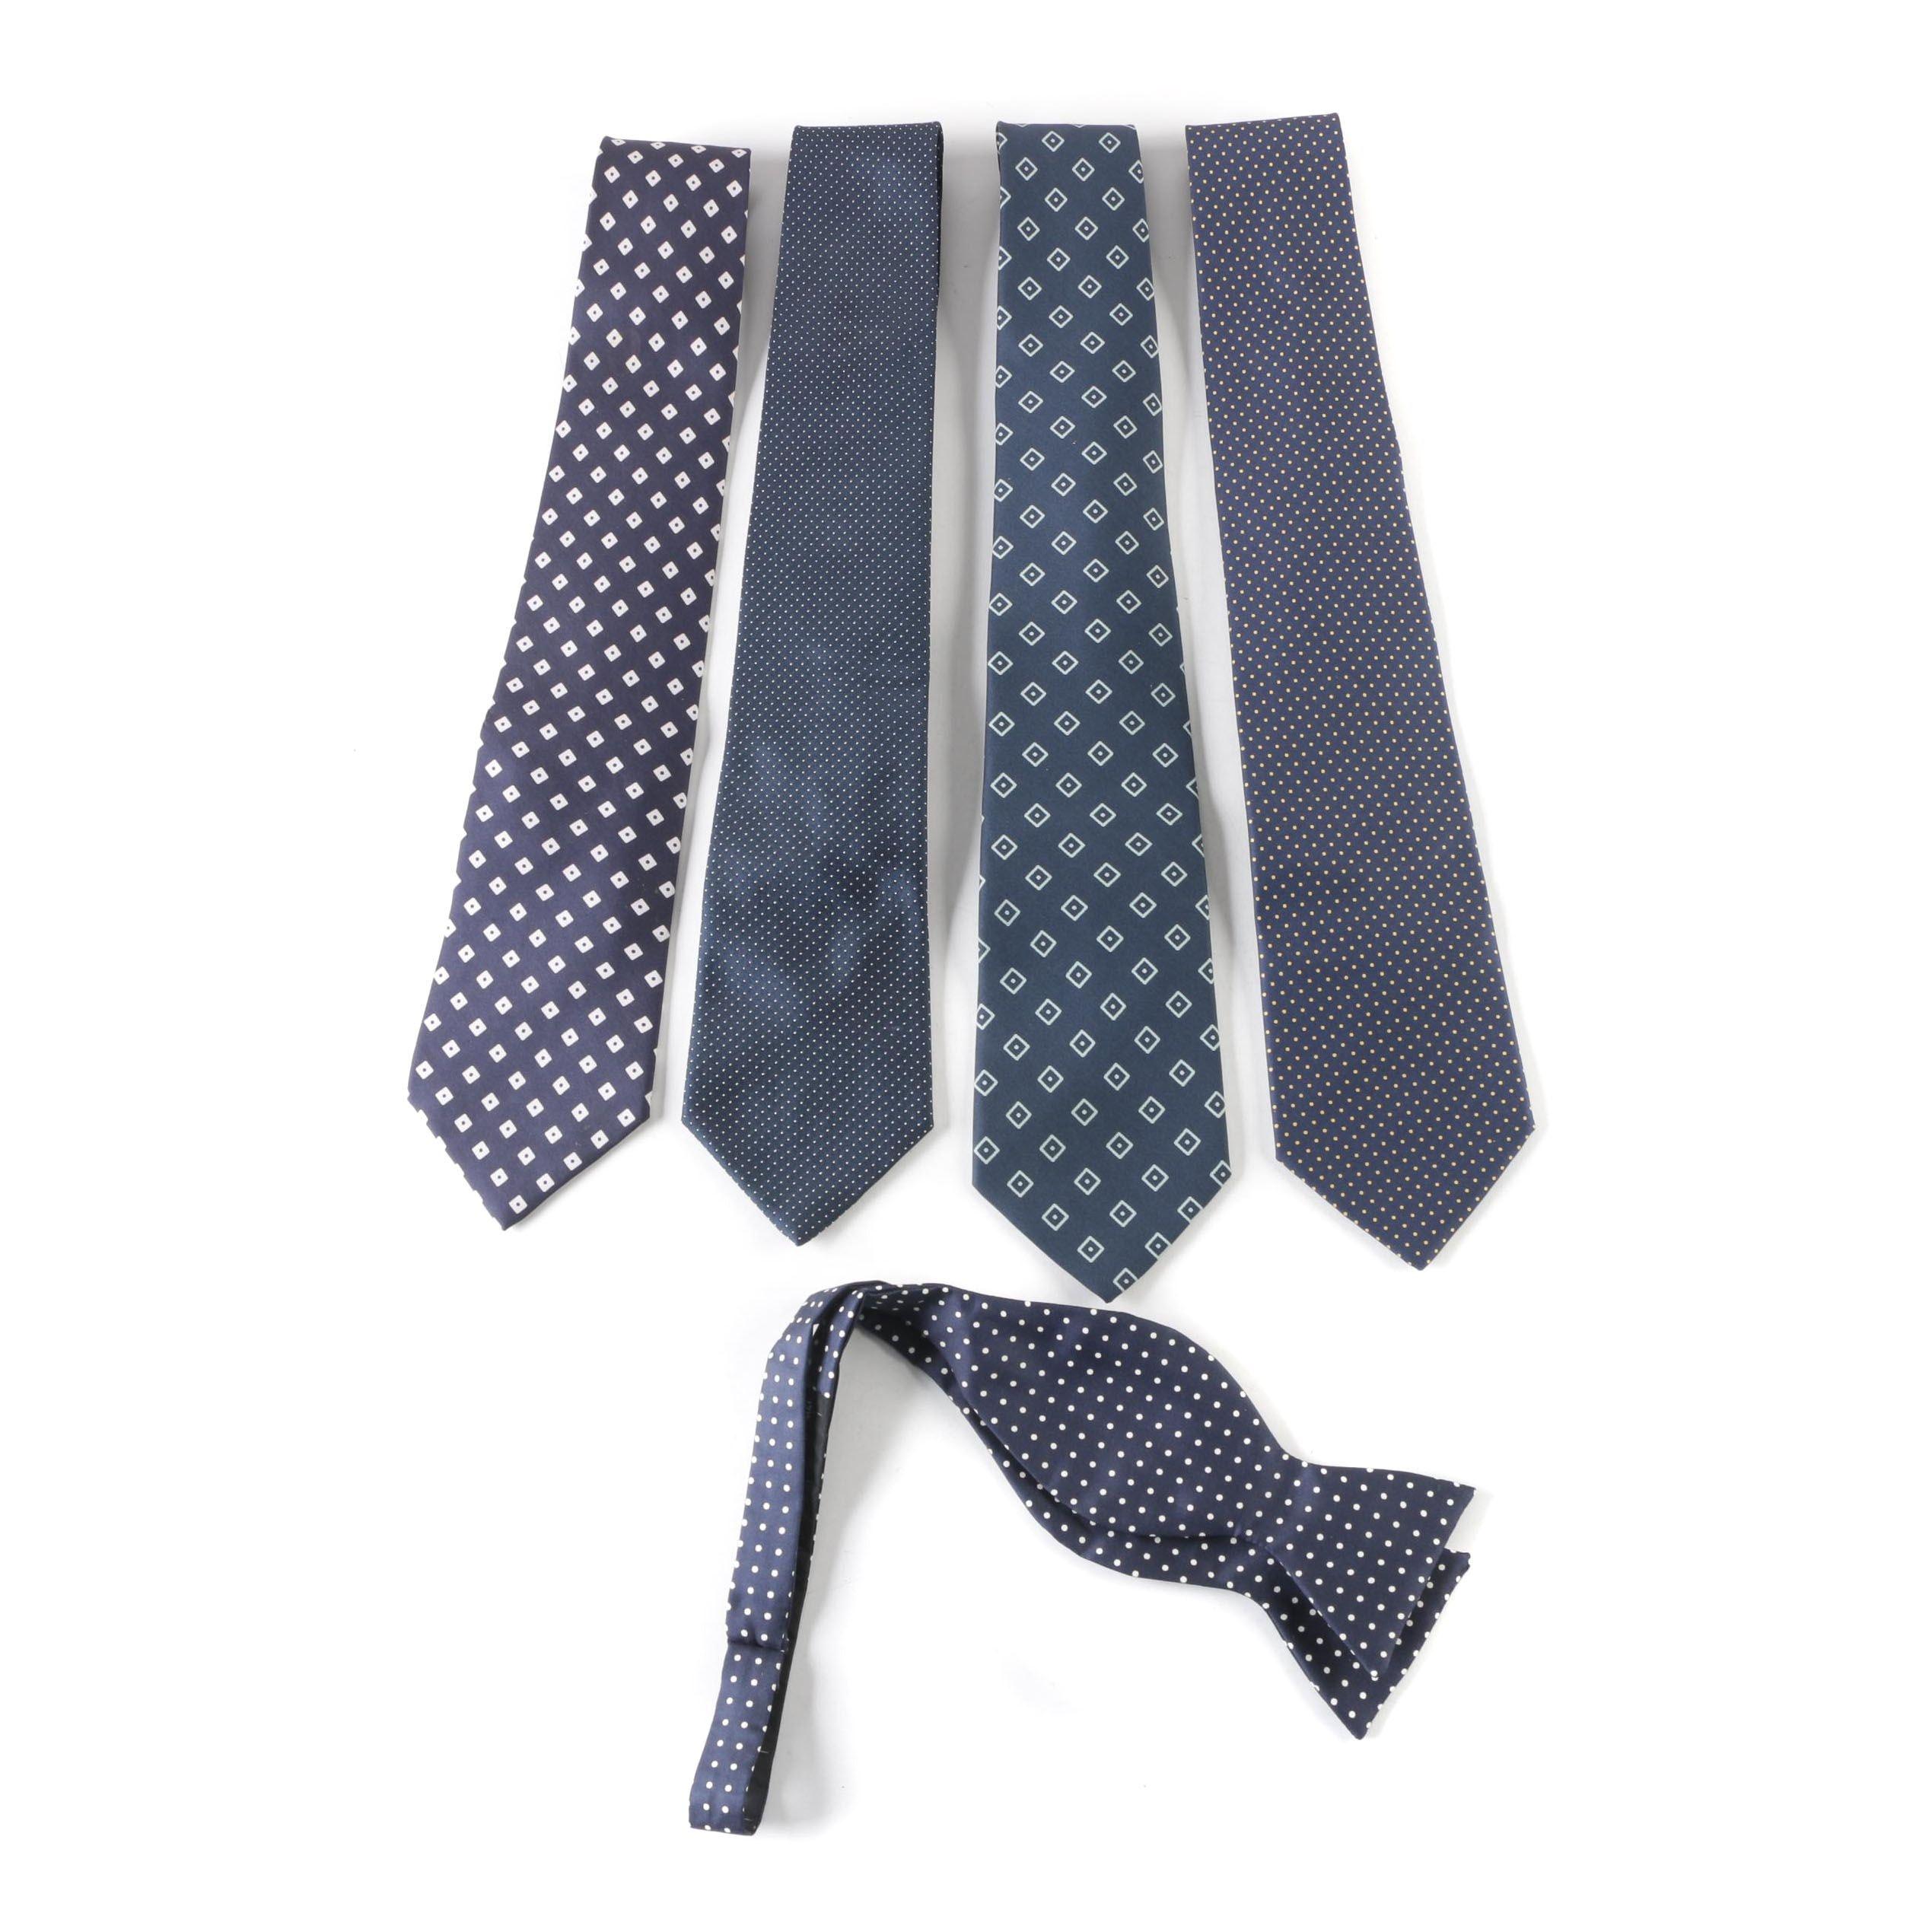 Charvet Place Vendôme Silk Neckties and Brooks Brothers Silk Bow Tie